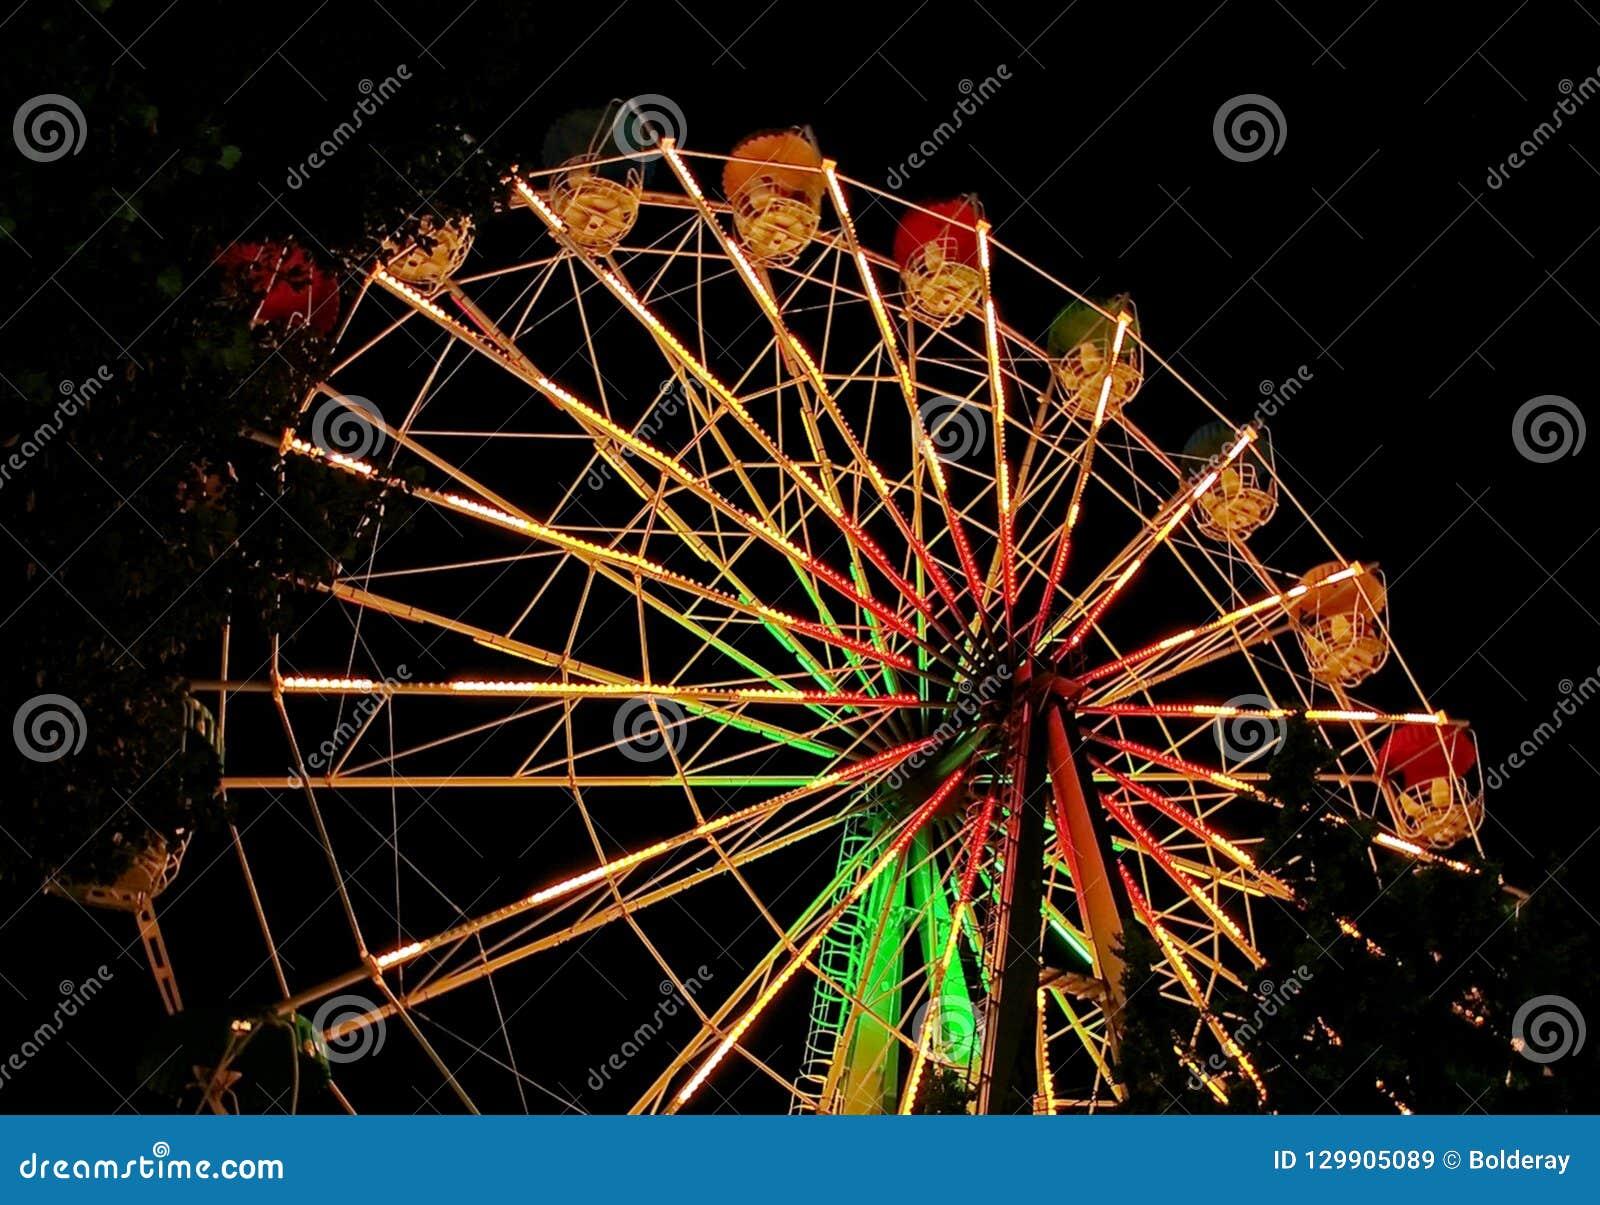 Ferris wheel against the background of the night sky. Night illumination ferris wheel.